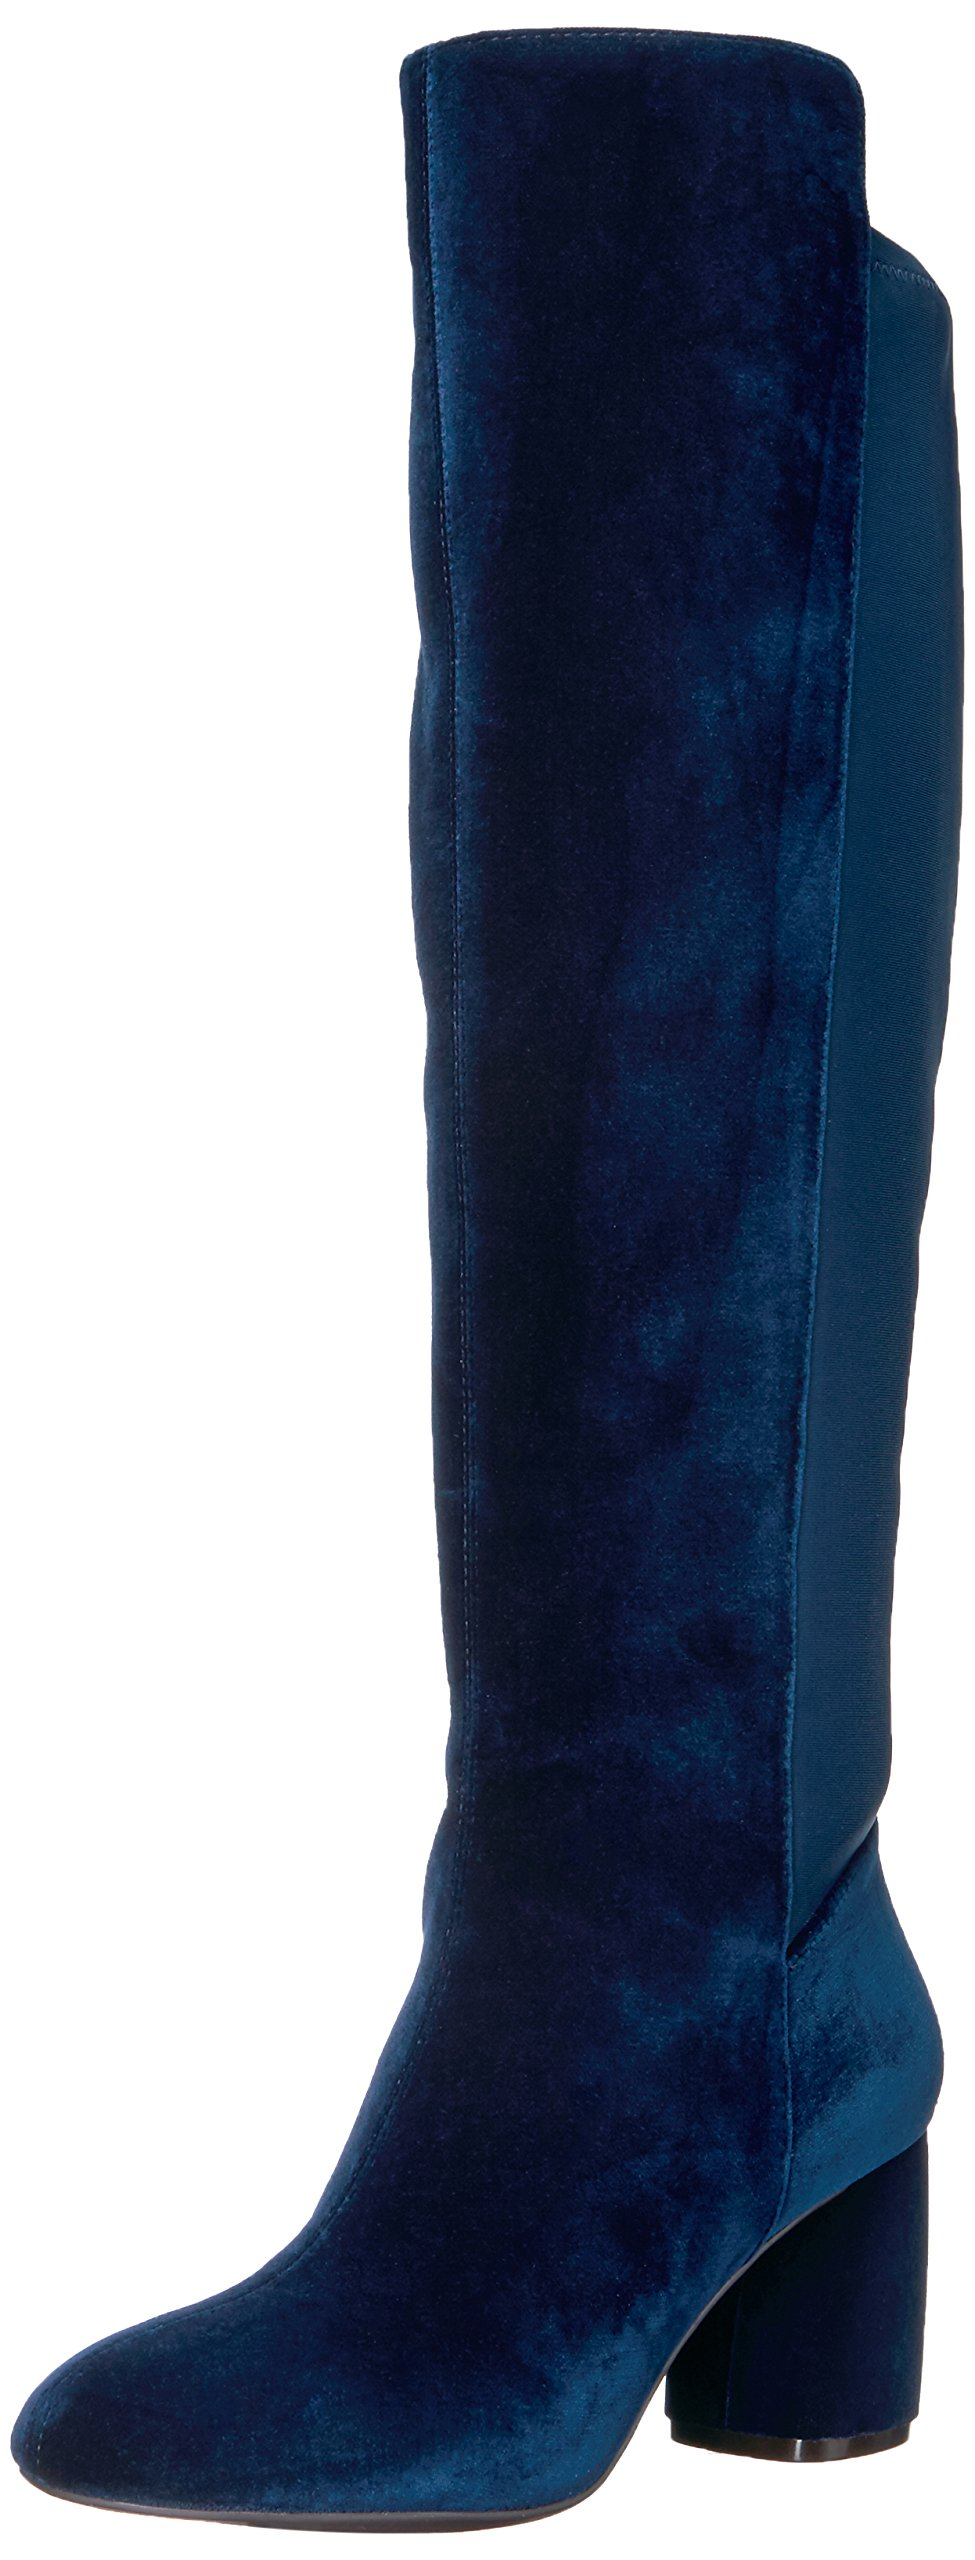 Nine West Women's Kerianna Knee High Boot, Navy Fabric, 9 Medium US